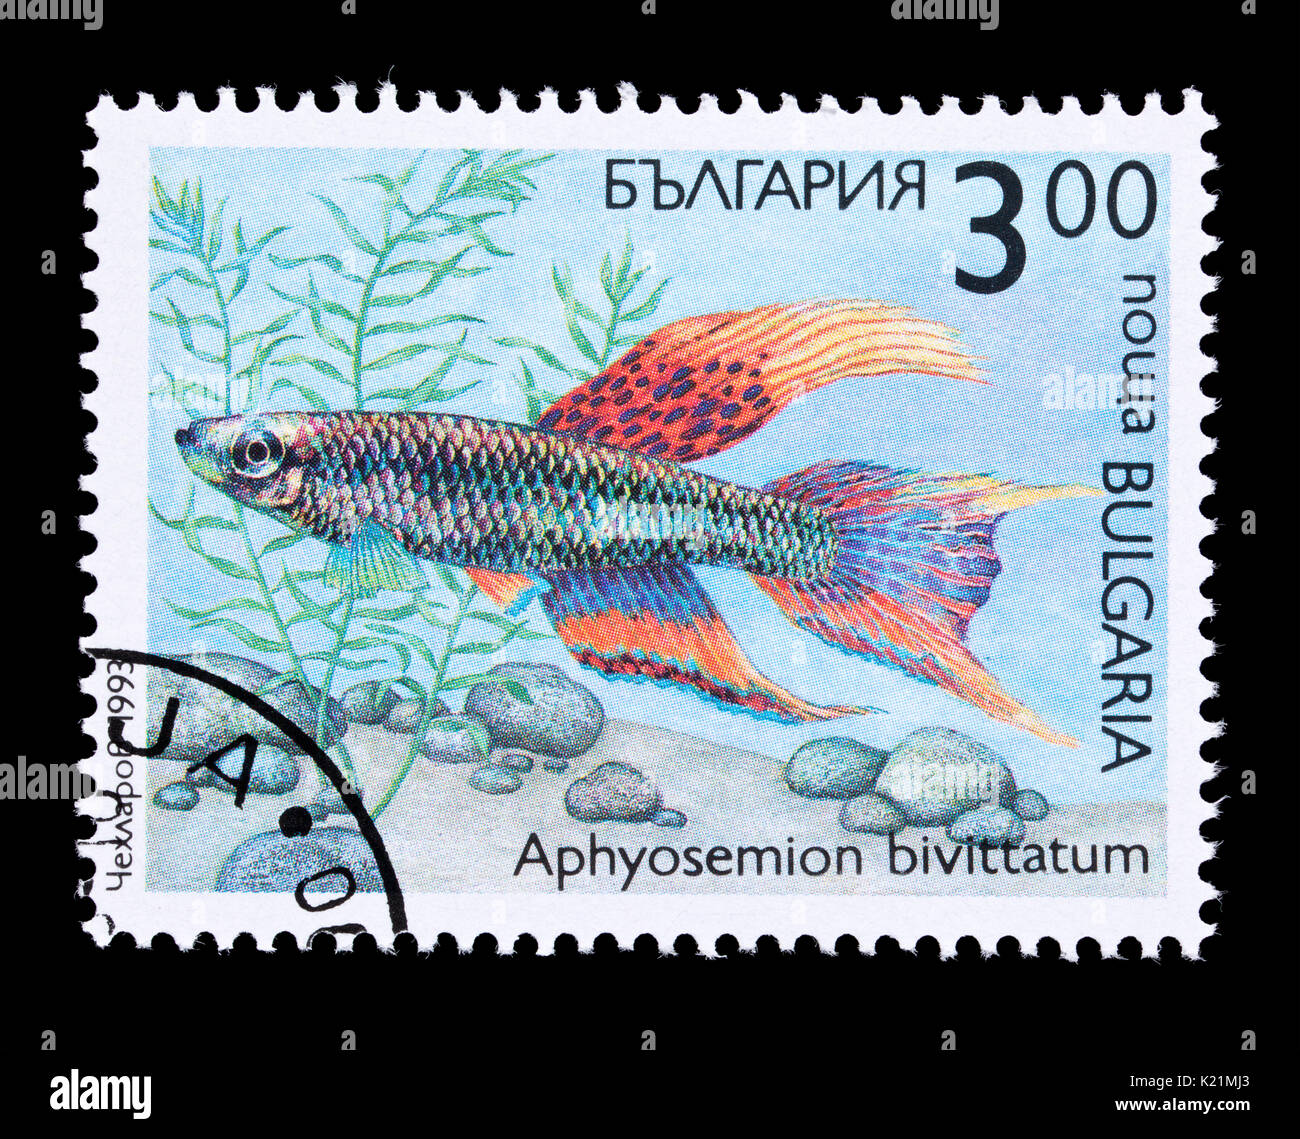 Postage stamp from Bulgaria depicting a Twostripe lyretail fish (Aphyosemion bivittatum) - Stock Image